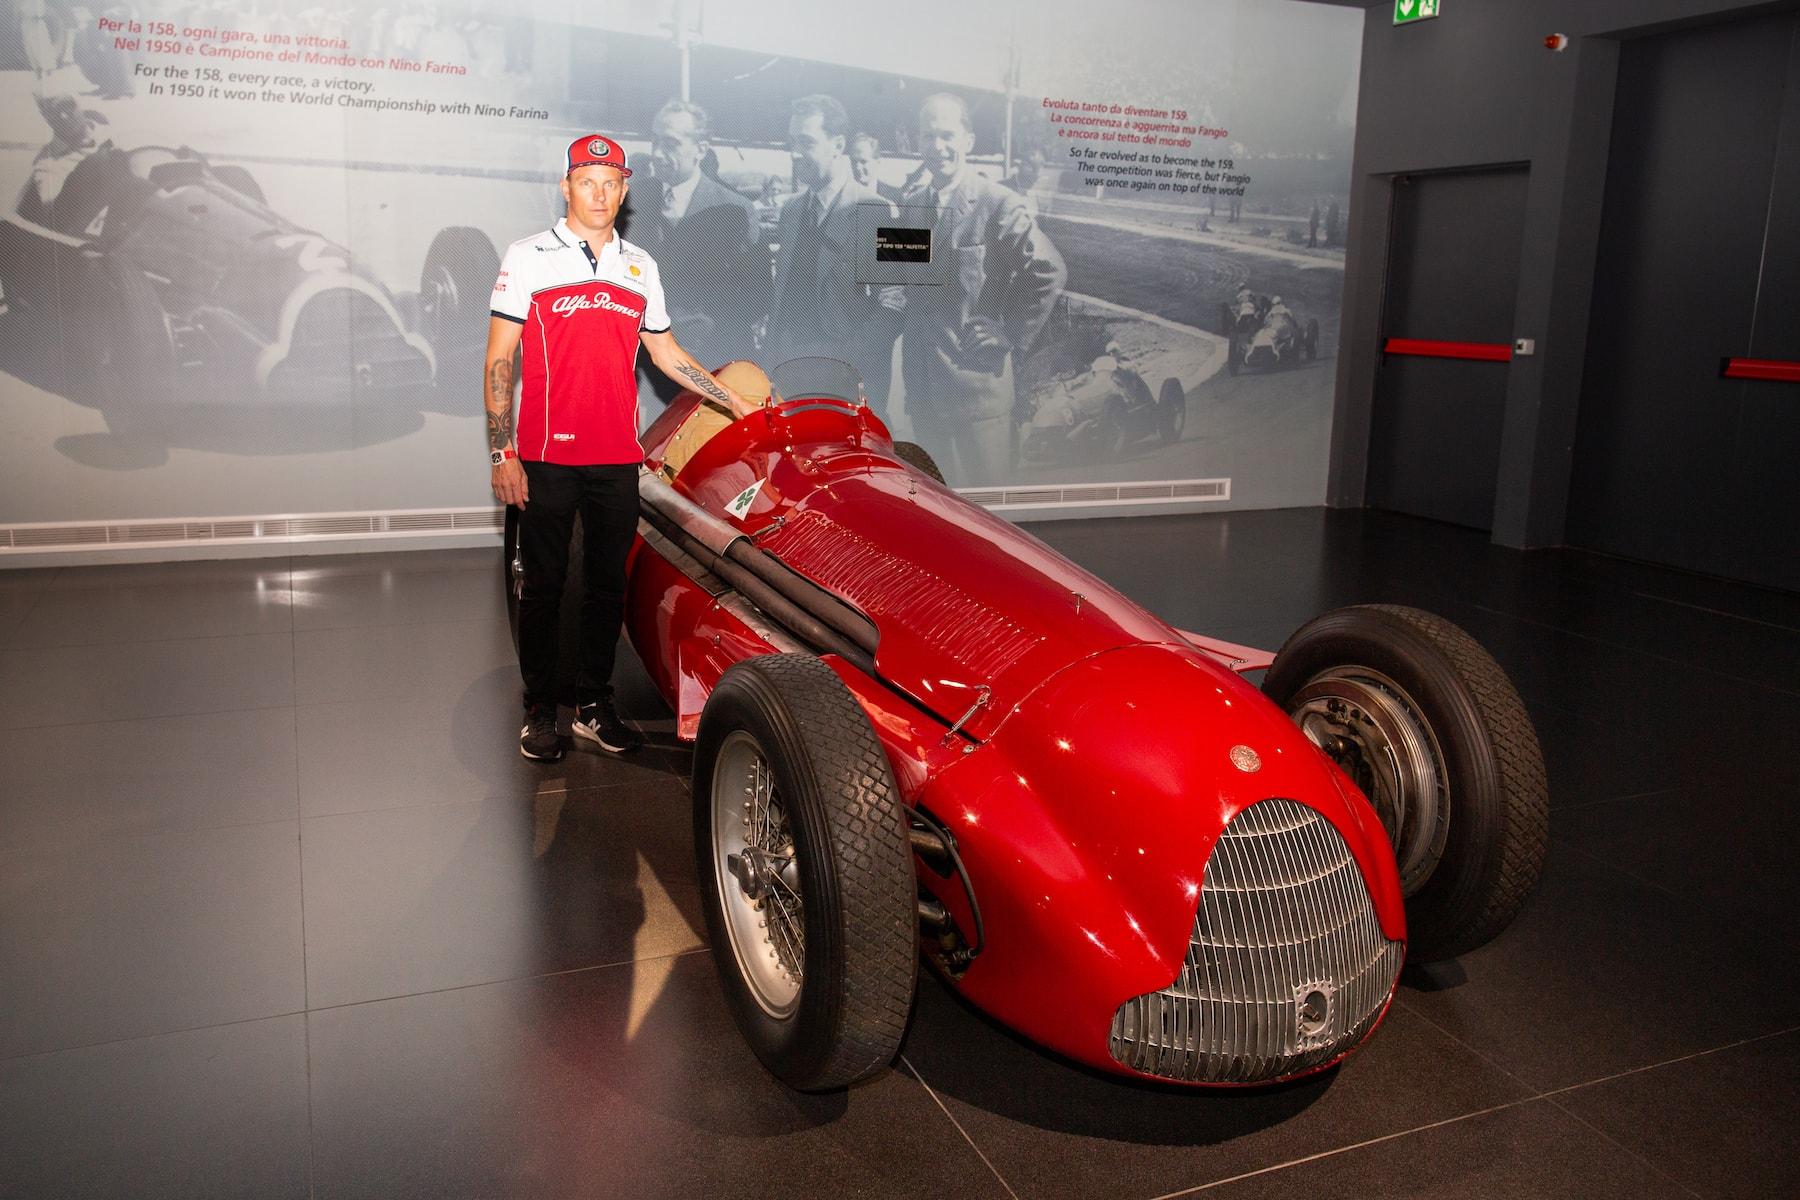 2019 Alfa Romeo at Museo Storico | 2019 Italian GP 7.jpg